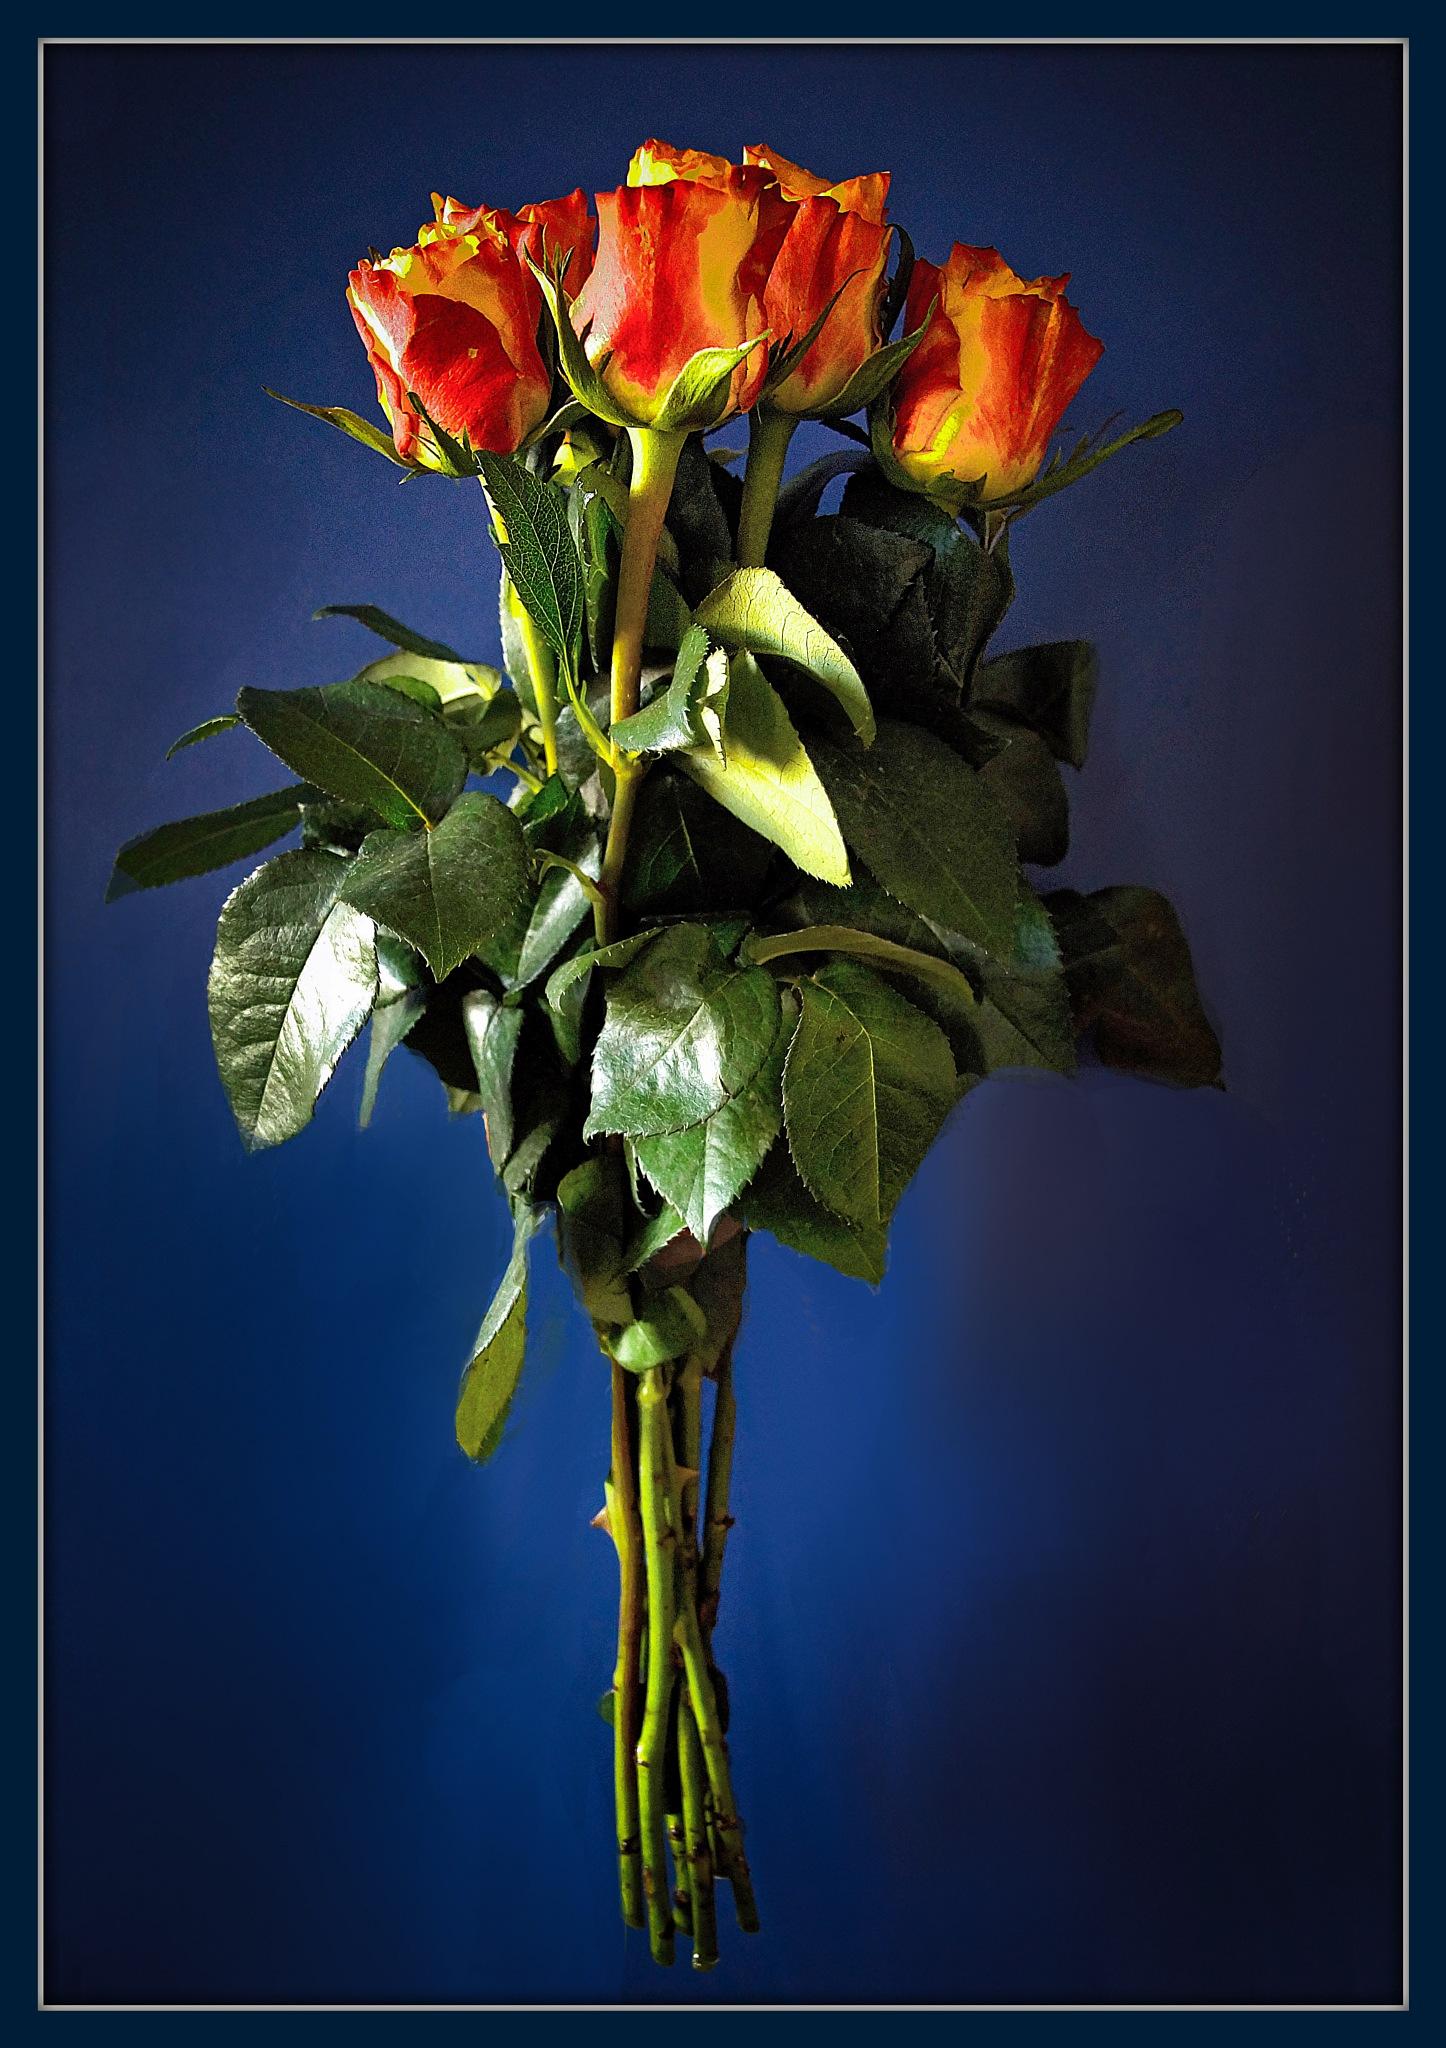 roses by darko1965